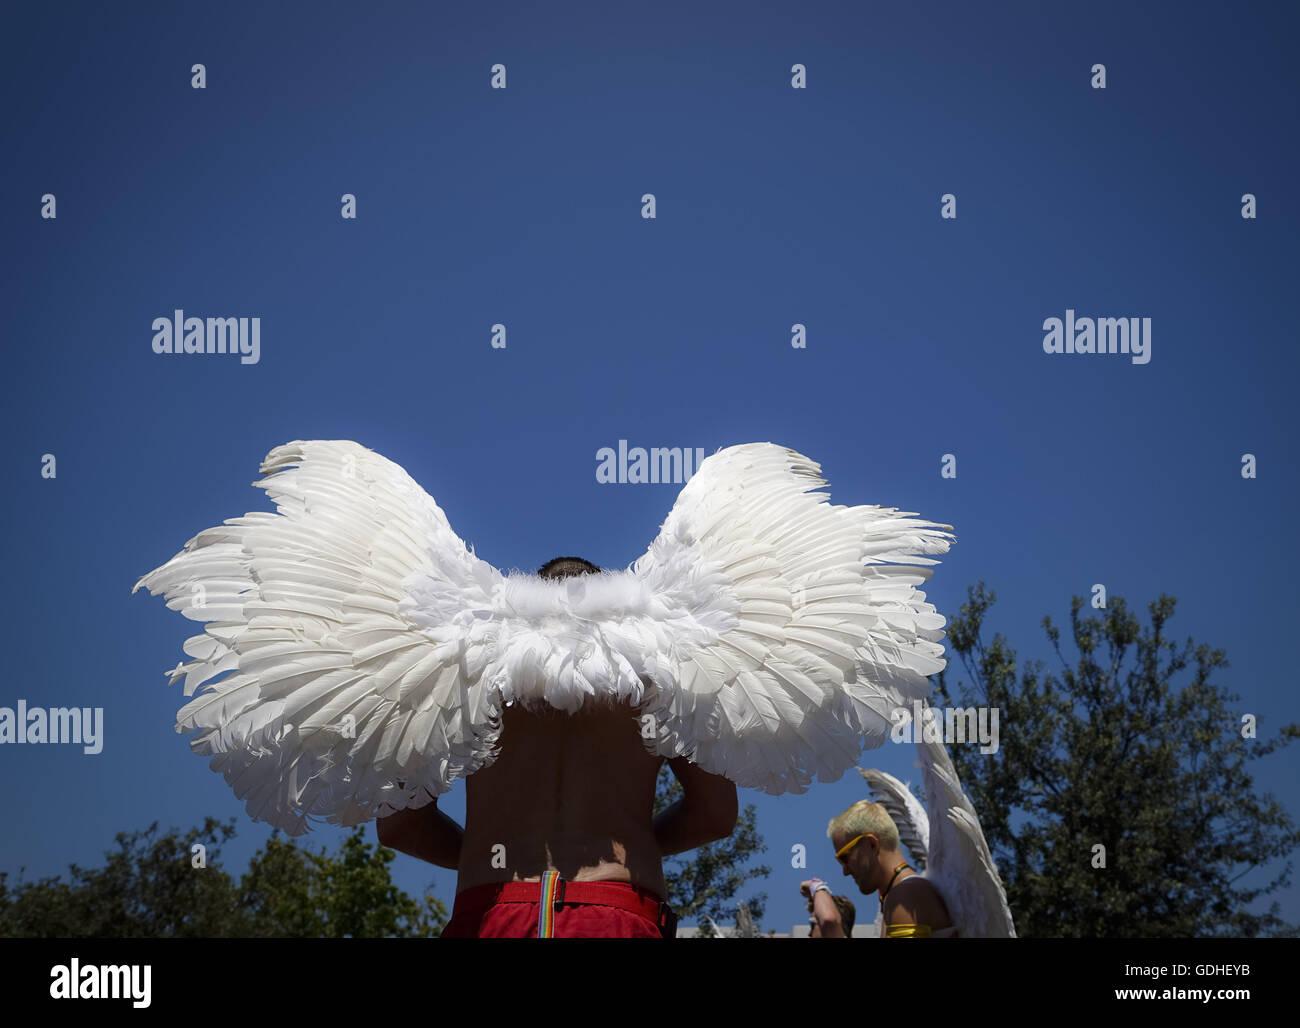 Gives You Wings Imágenes De Stock & Gives You Wings Fotos De Stock ...